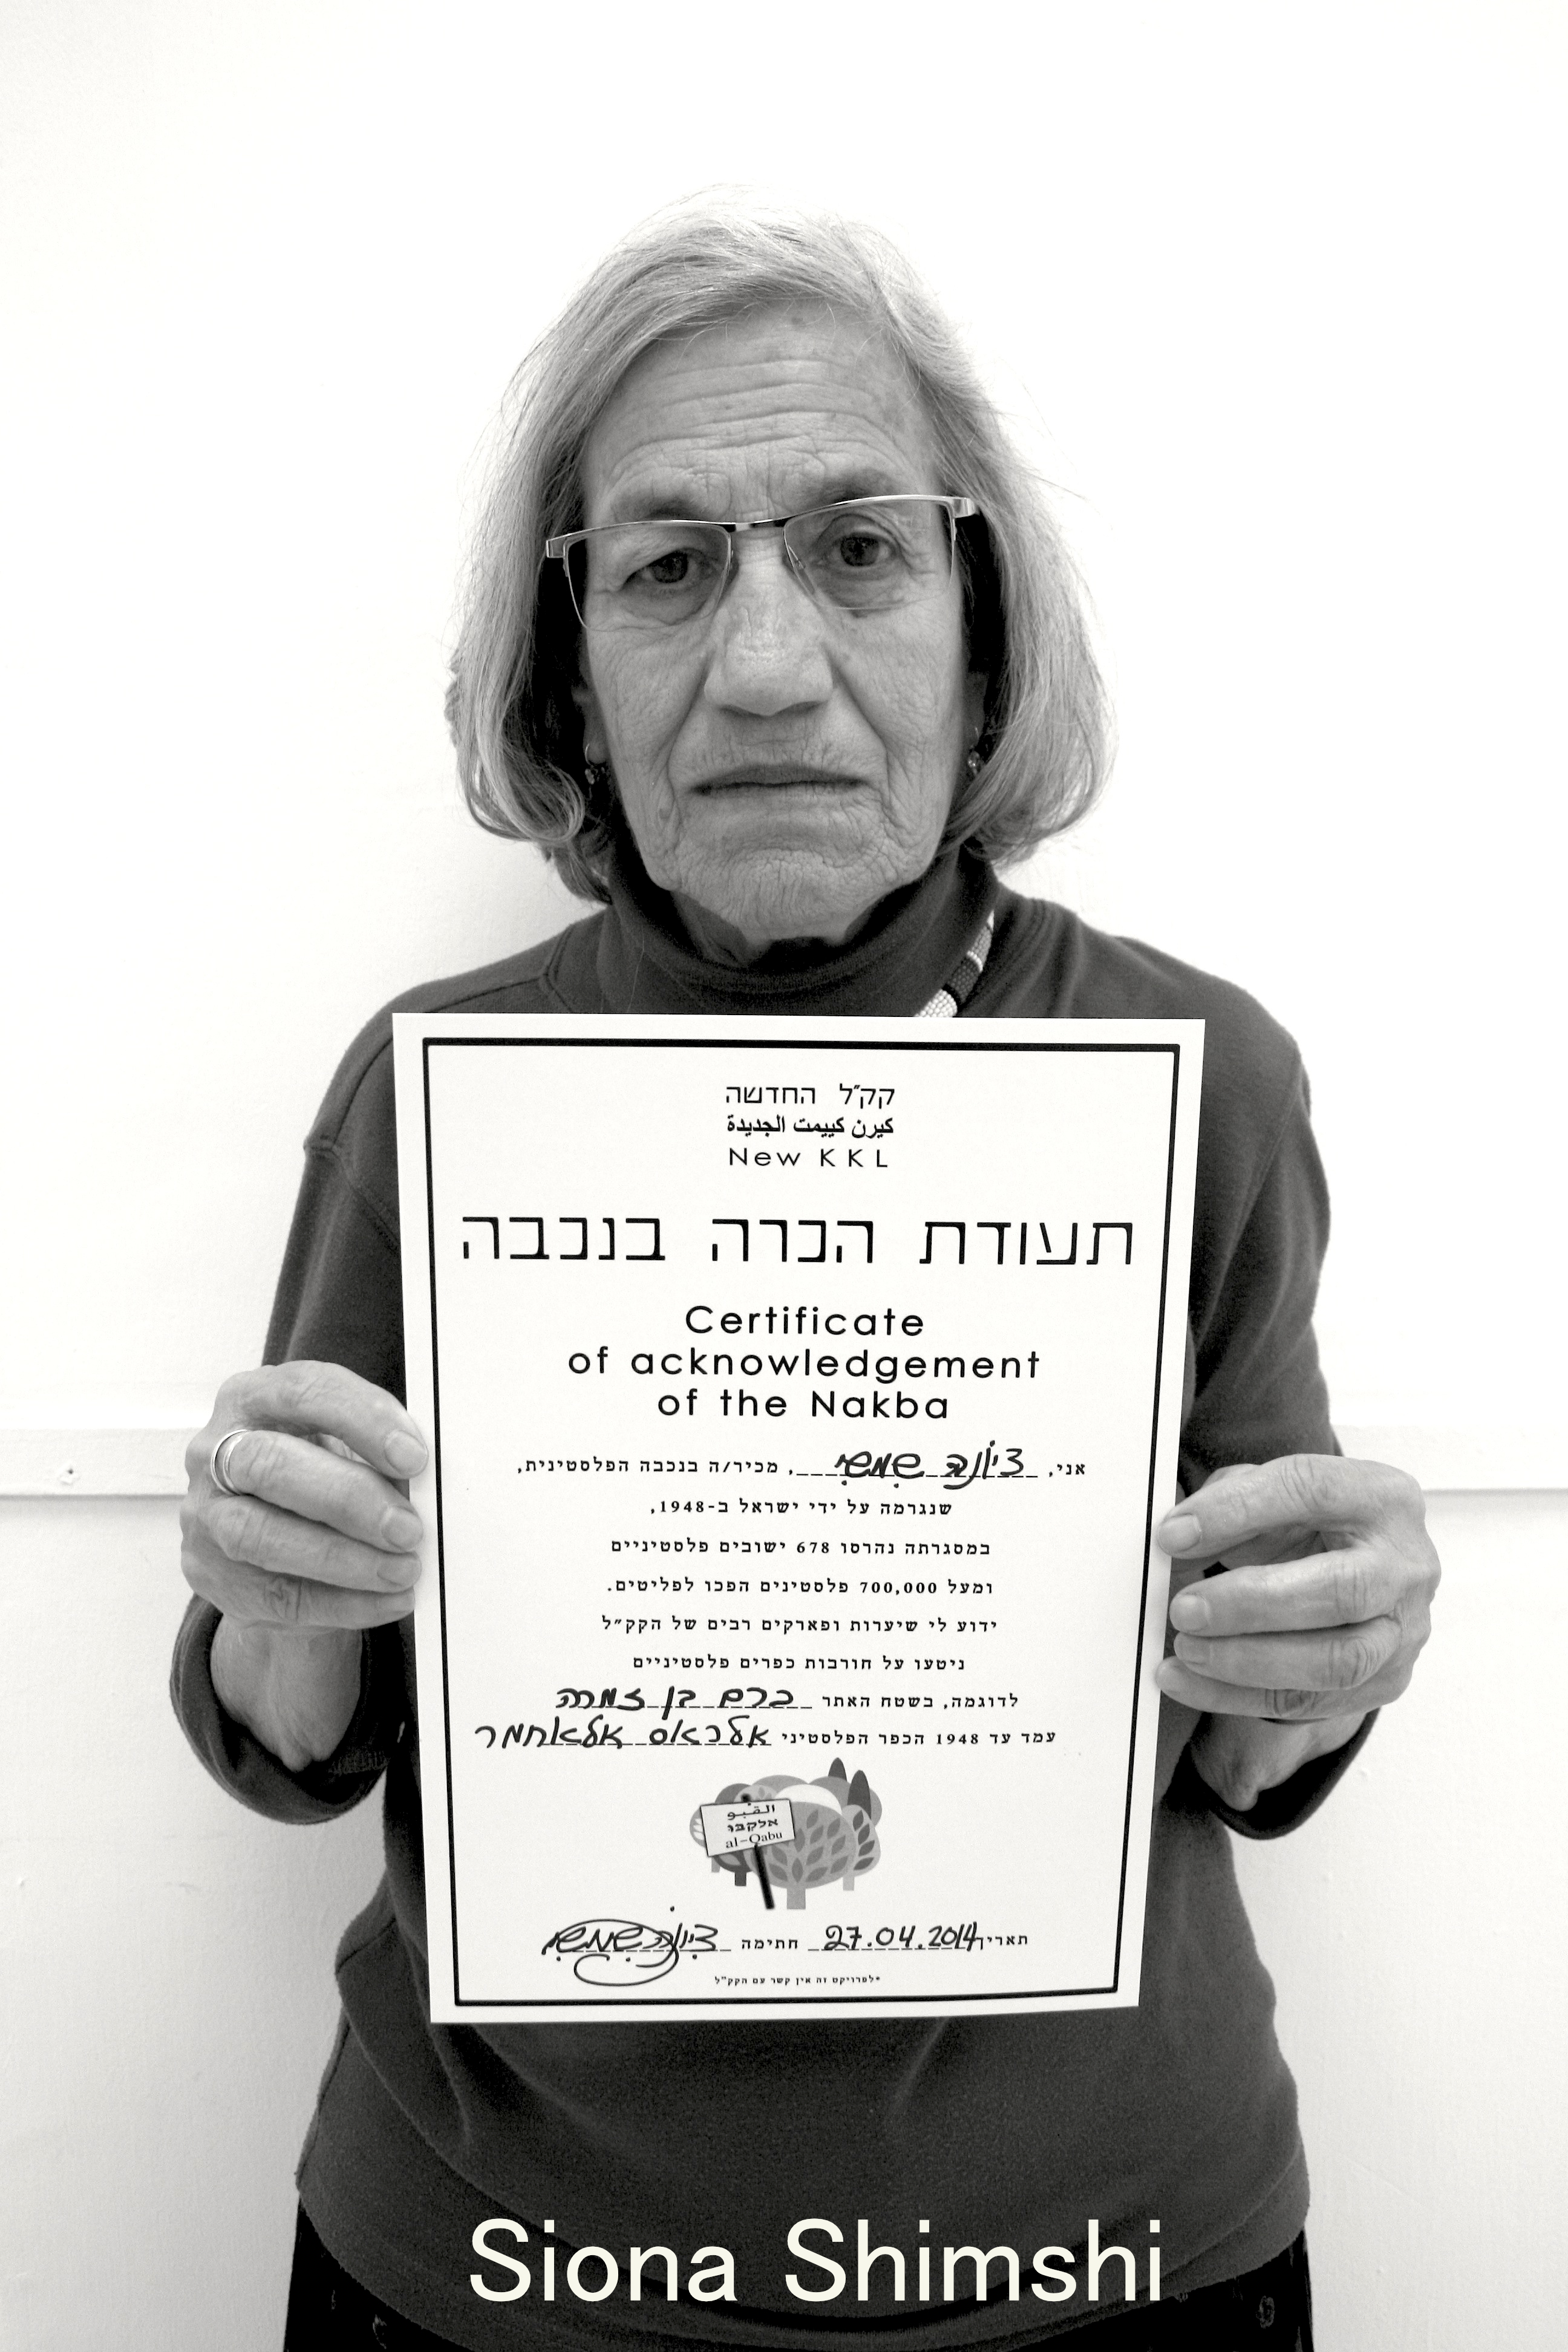 Siona acknowledges the Nakba.